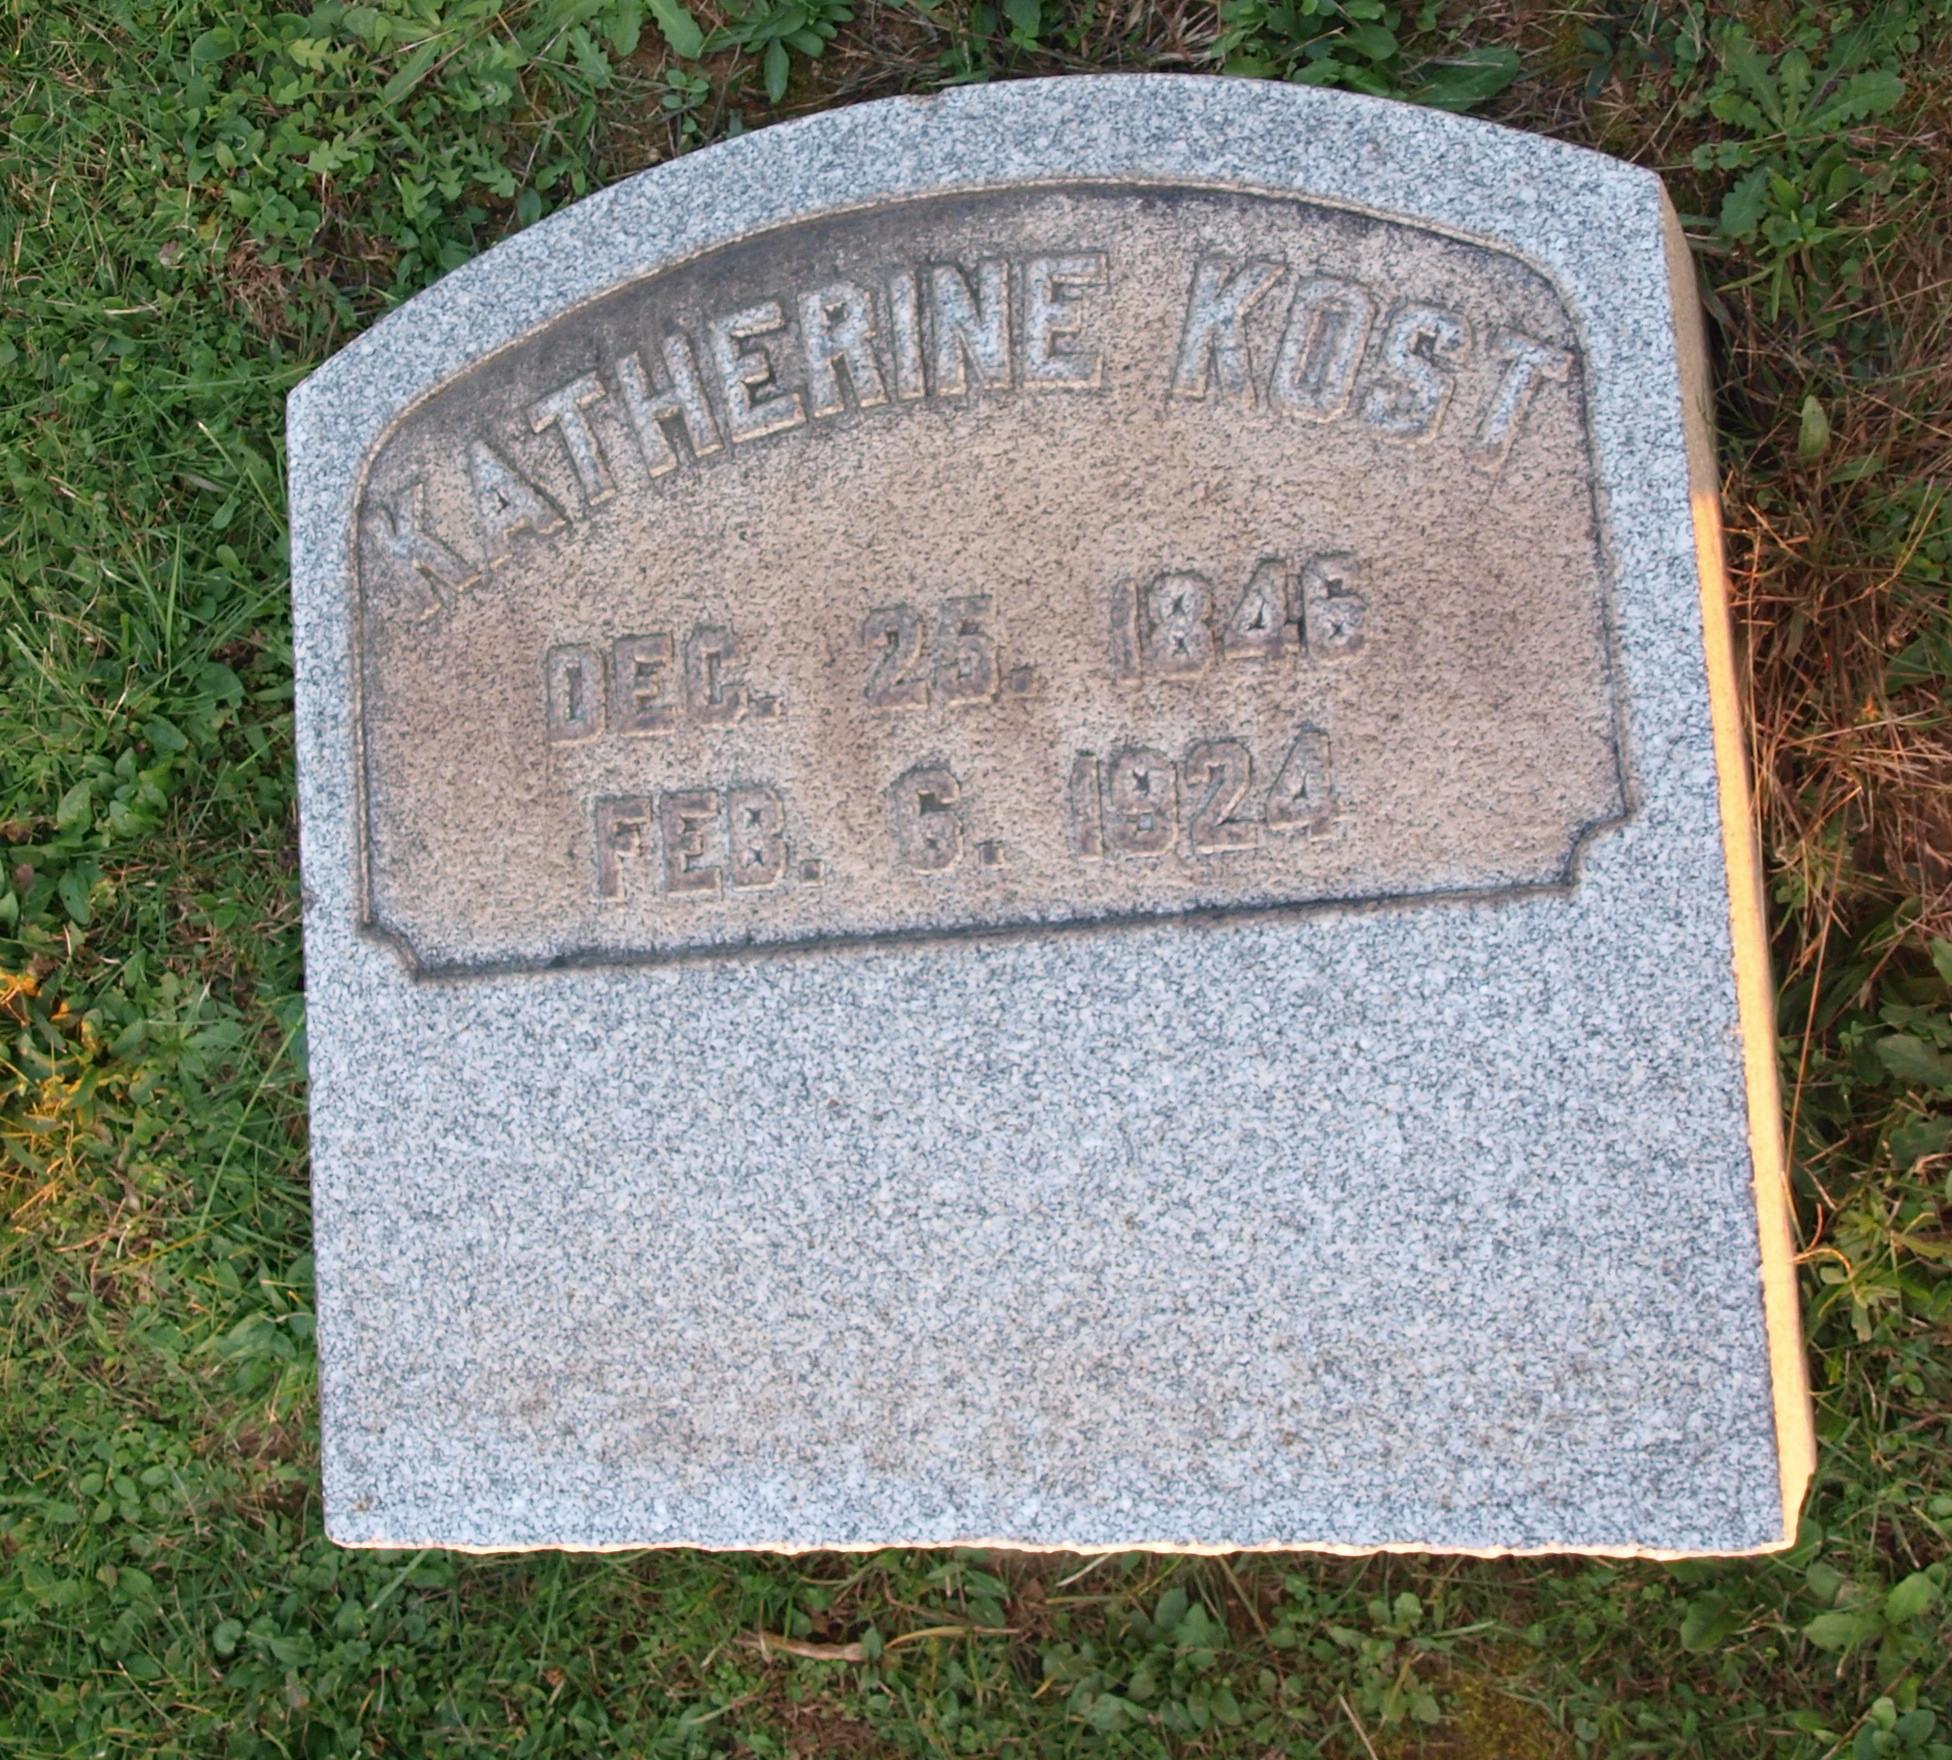 Katherine Kost